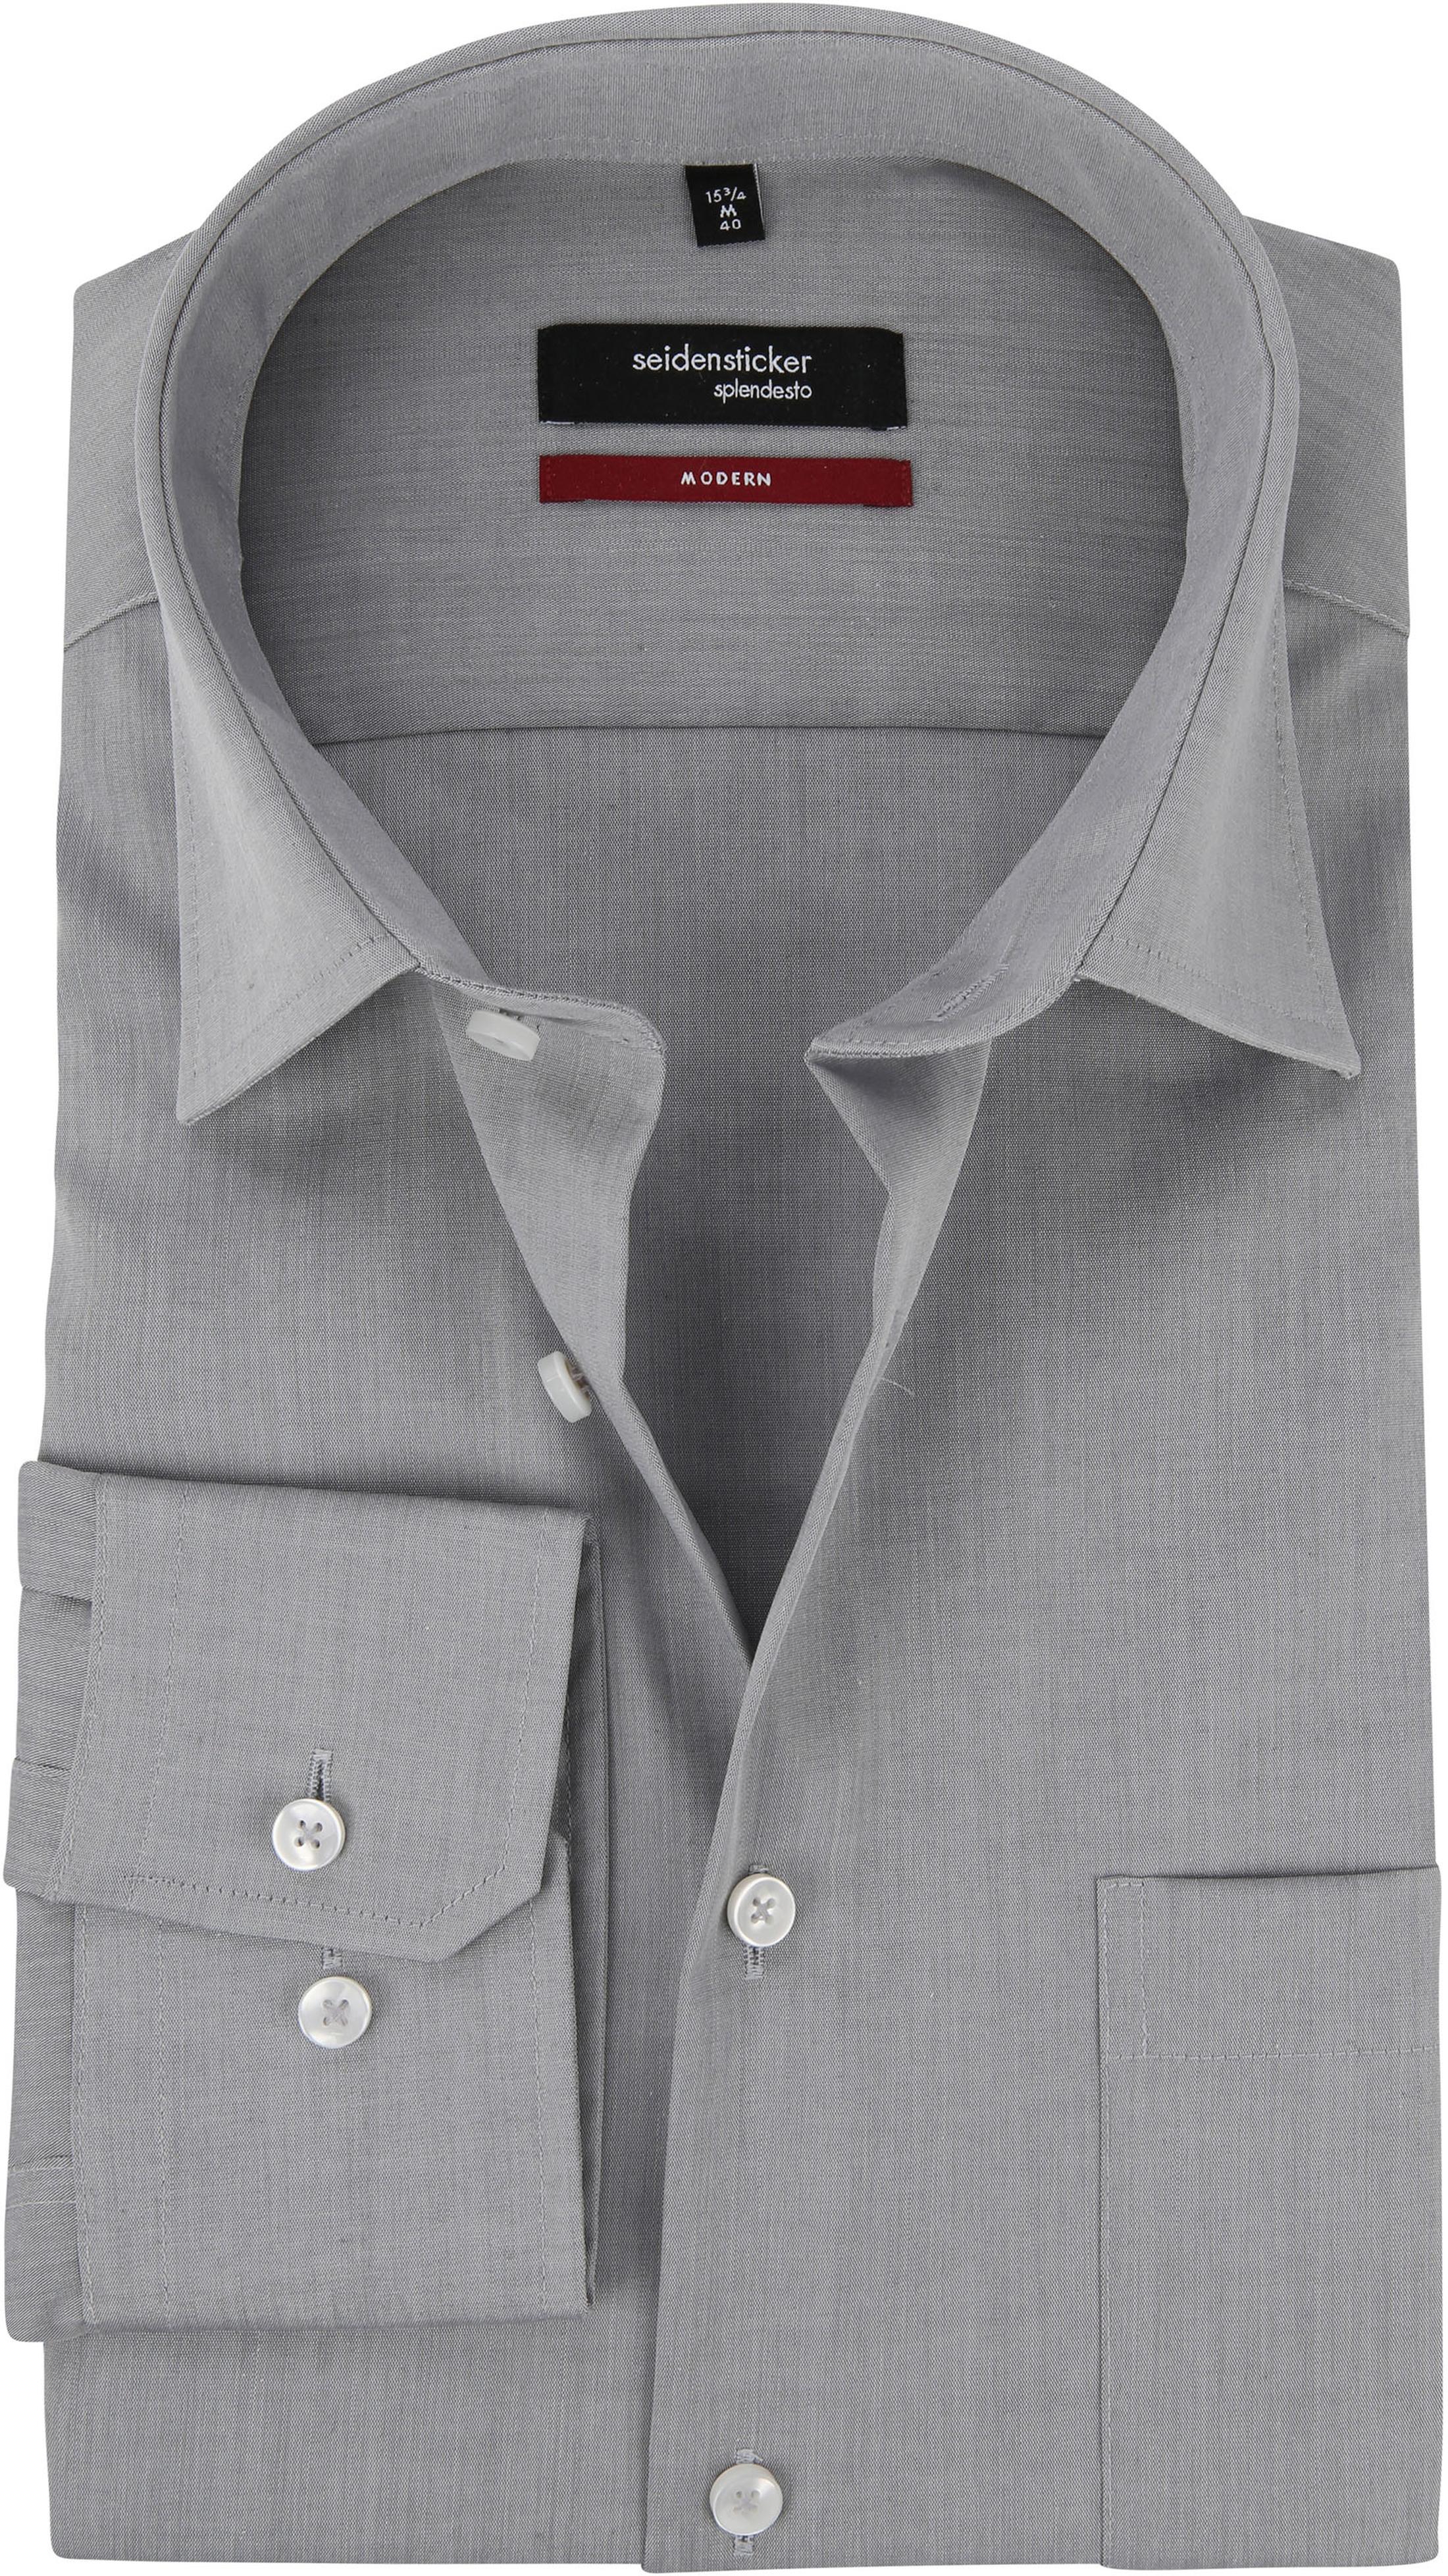 Seidensticker Hemd Bügelfrei Modern Grau foto 0